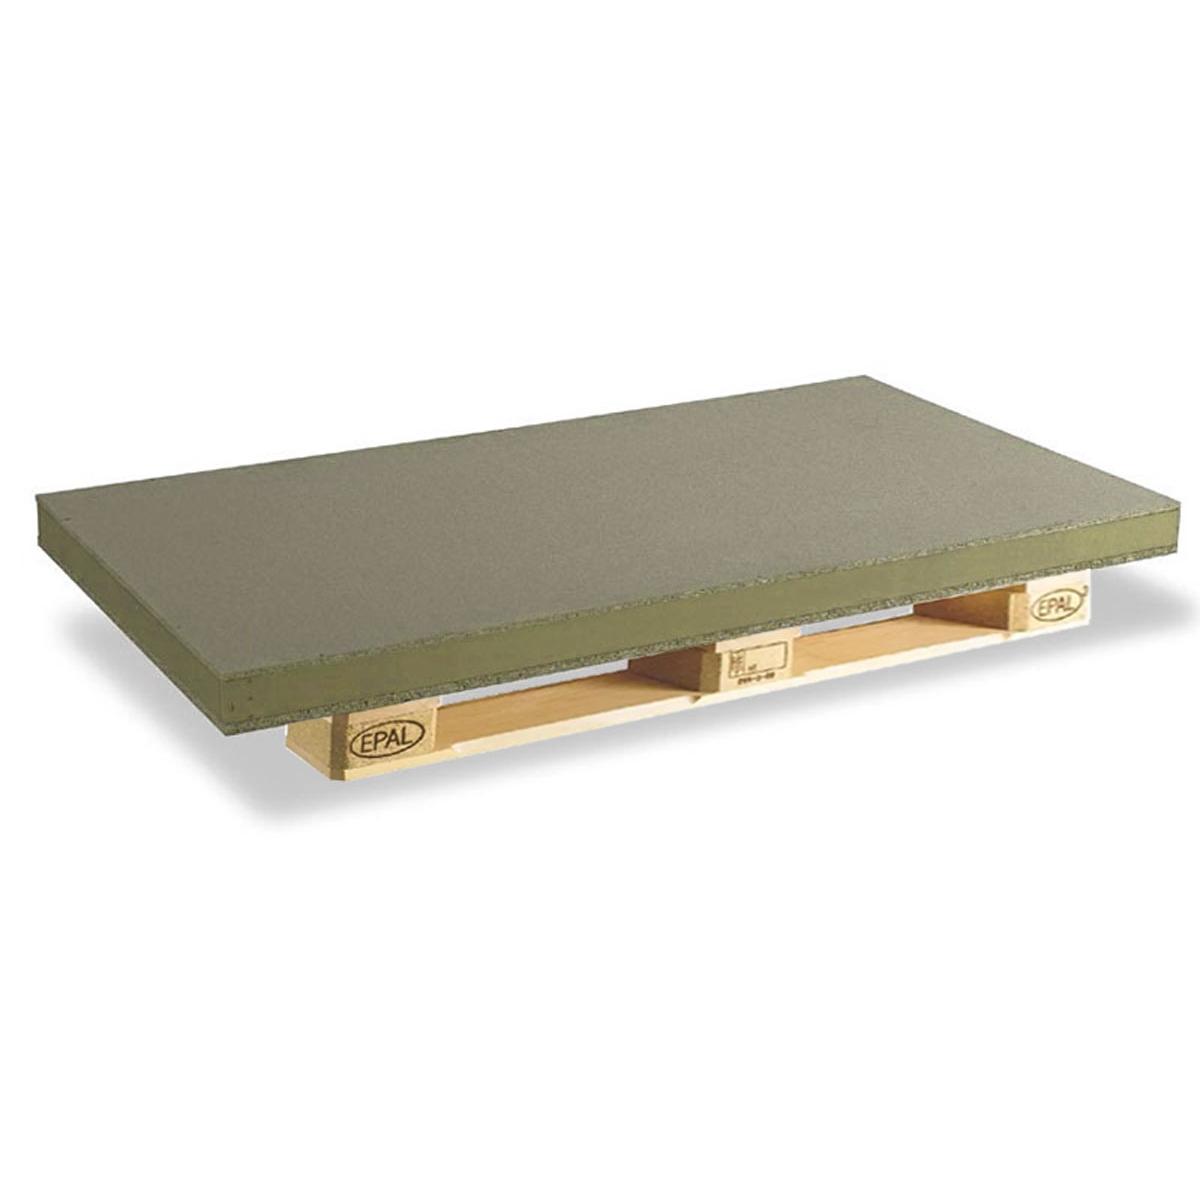 Plato de ducha rectangular 100x80 Ares Stone Nox Perla